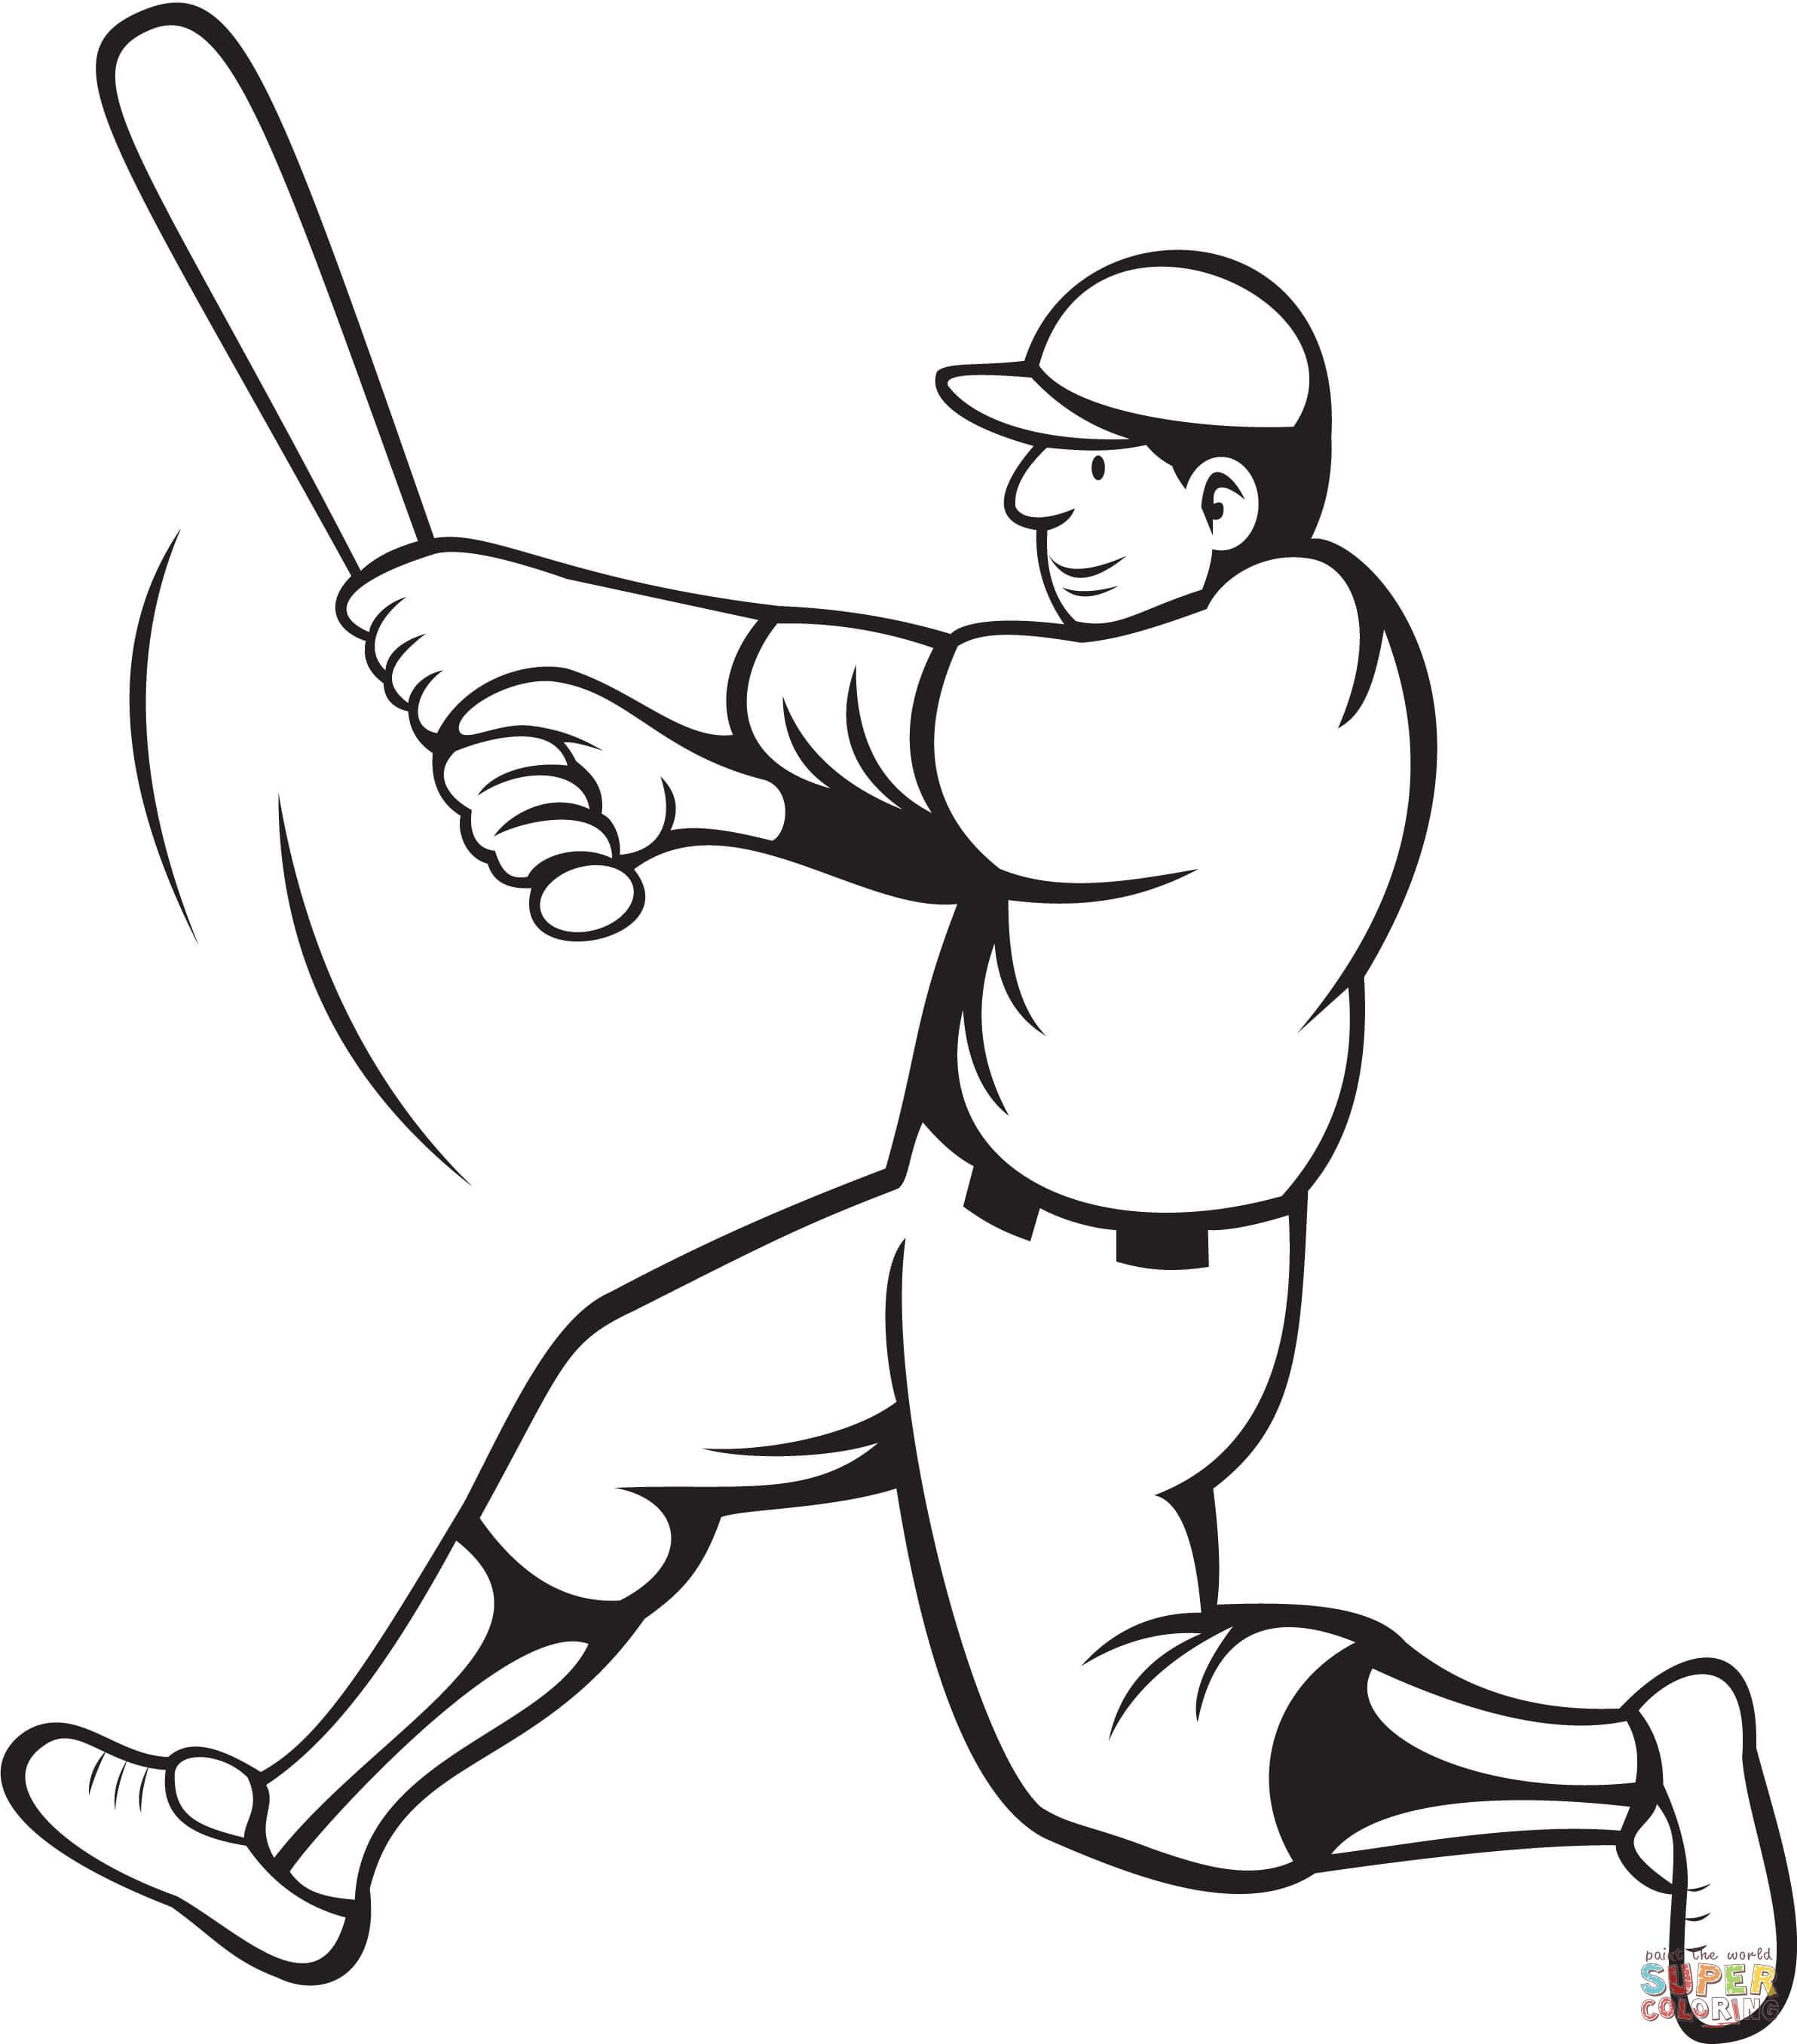 Baseball Coloring Pages Free Jackieobinson Page Printable Pdf - Jackie Robinson Free Printables